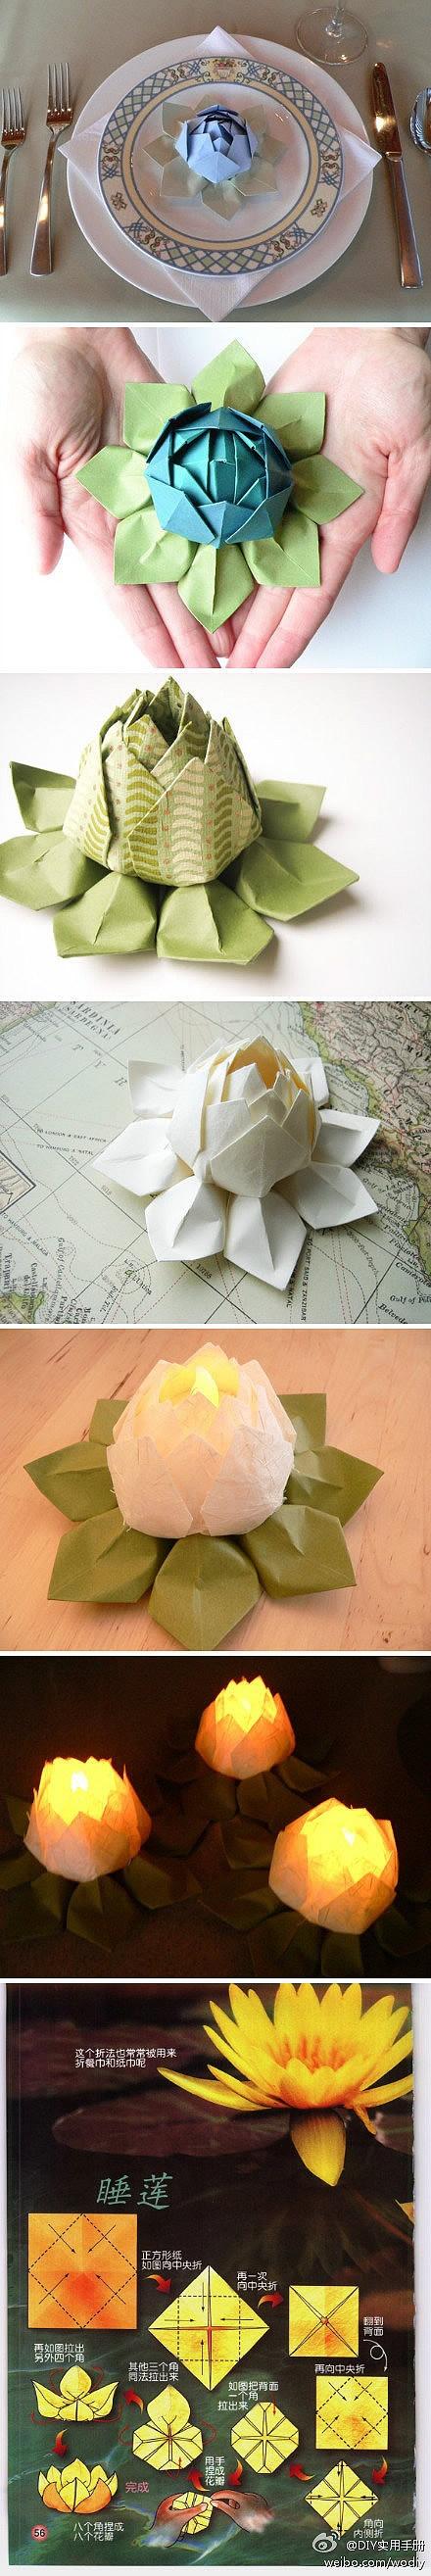 29 Best Paper Flowers Images On Pinterest Bending Rose Flower Diagram Rosebox Origami Water Lily Love Making